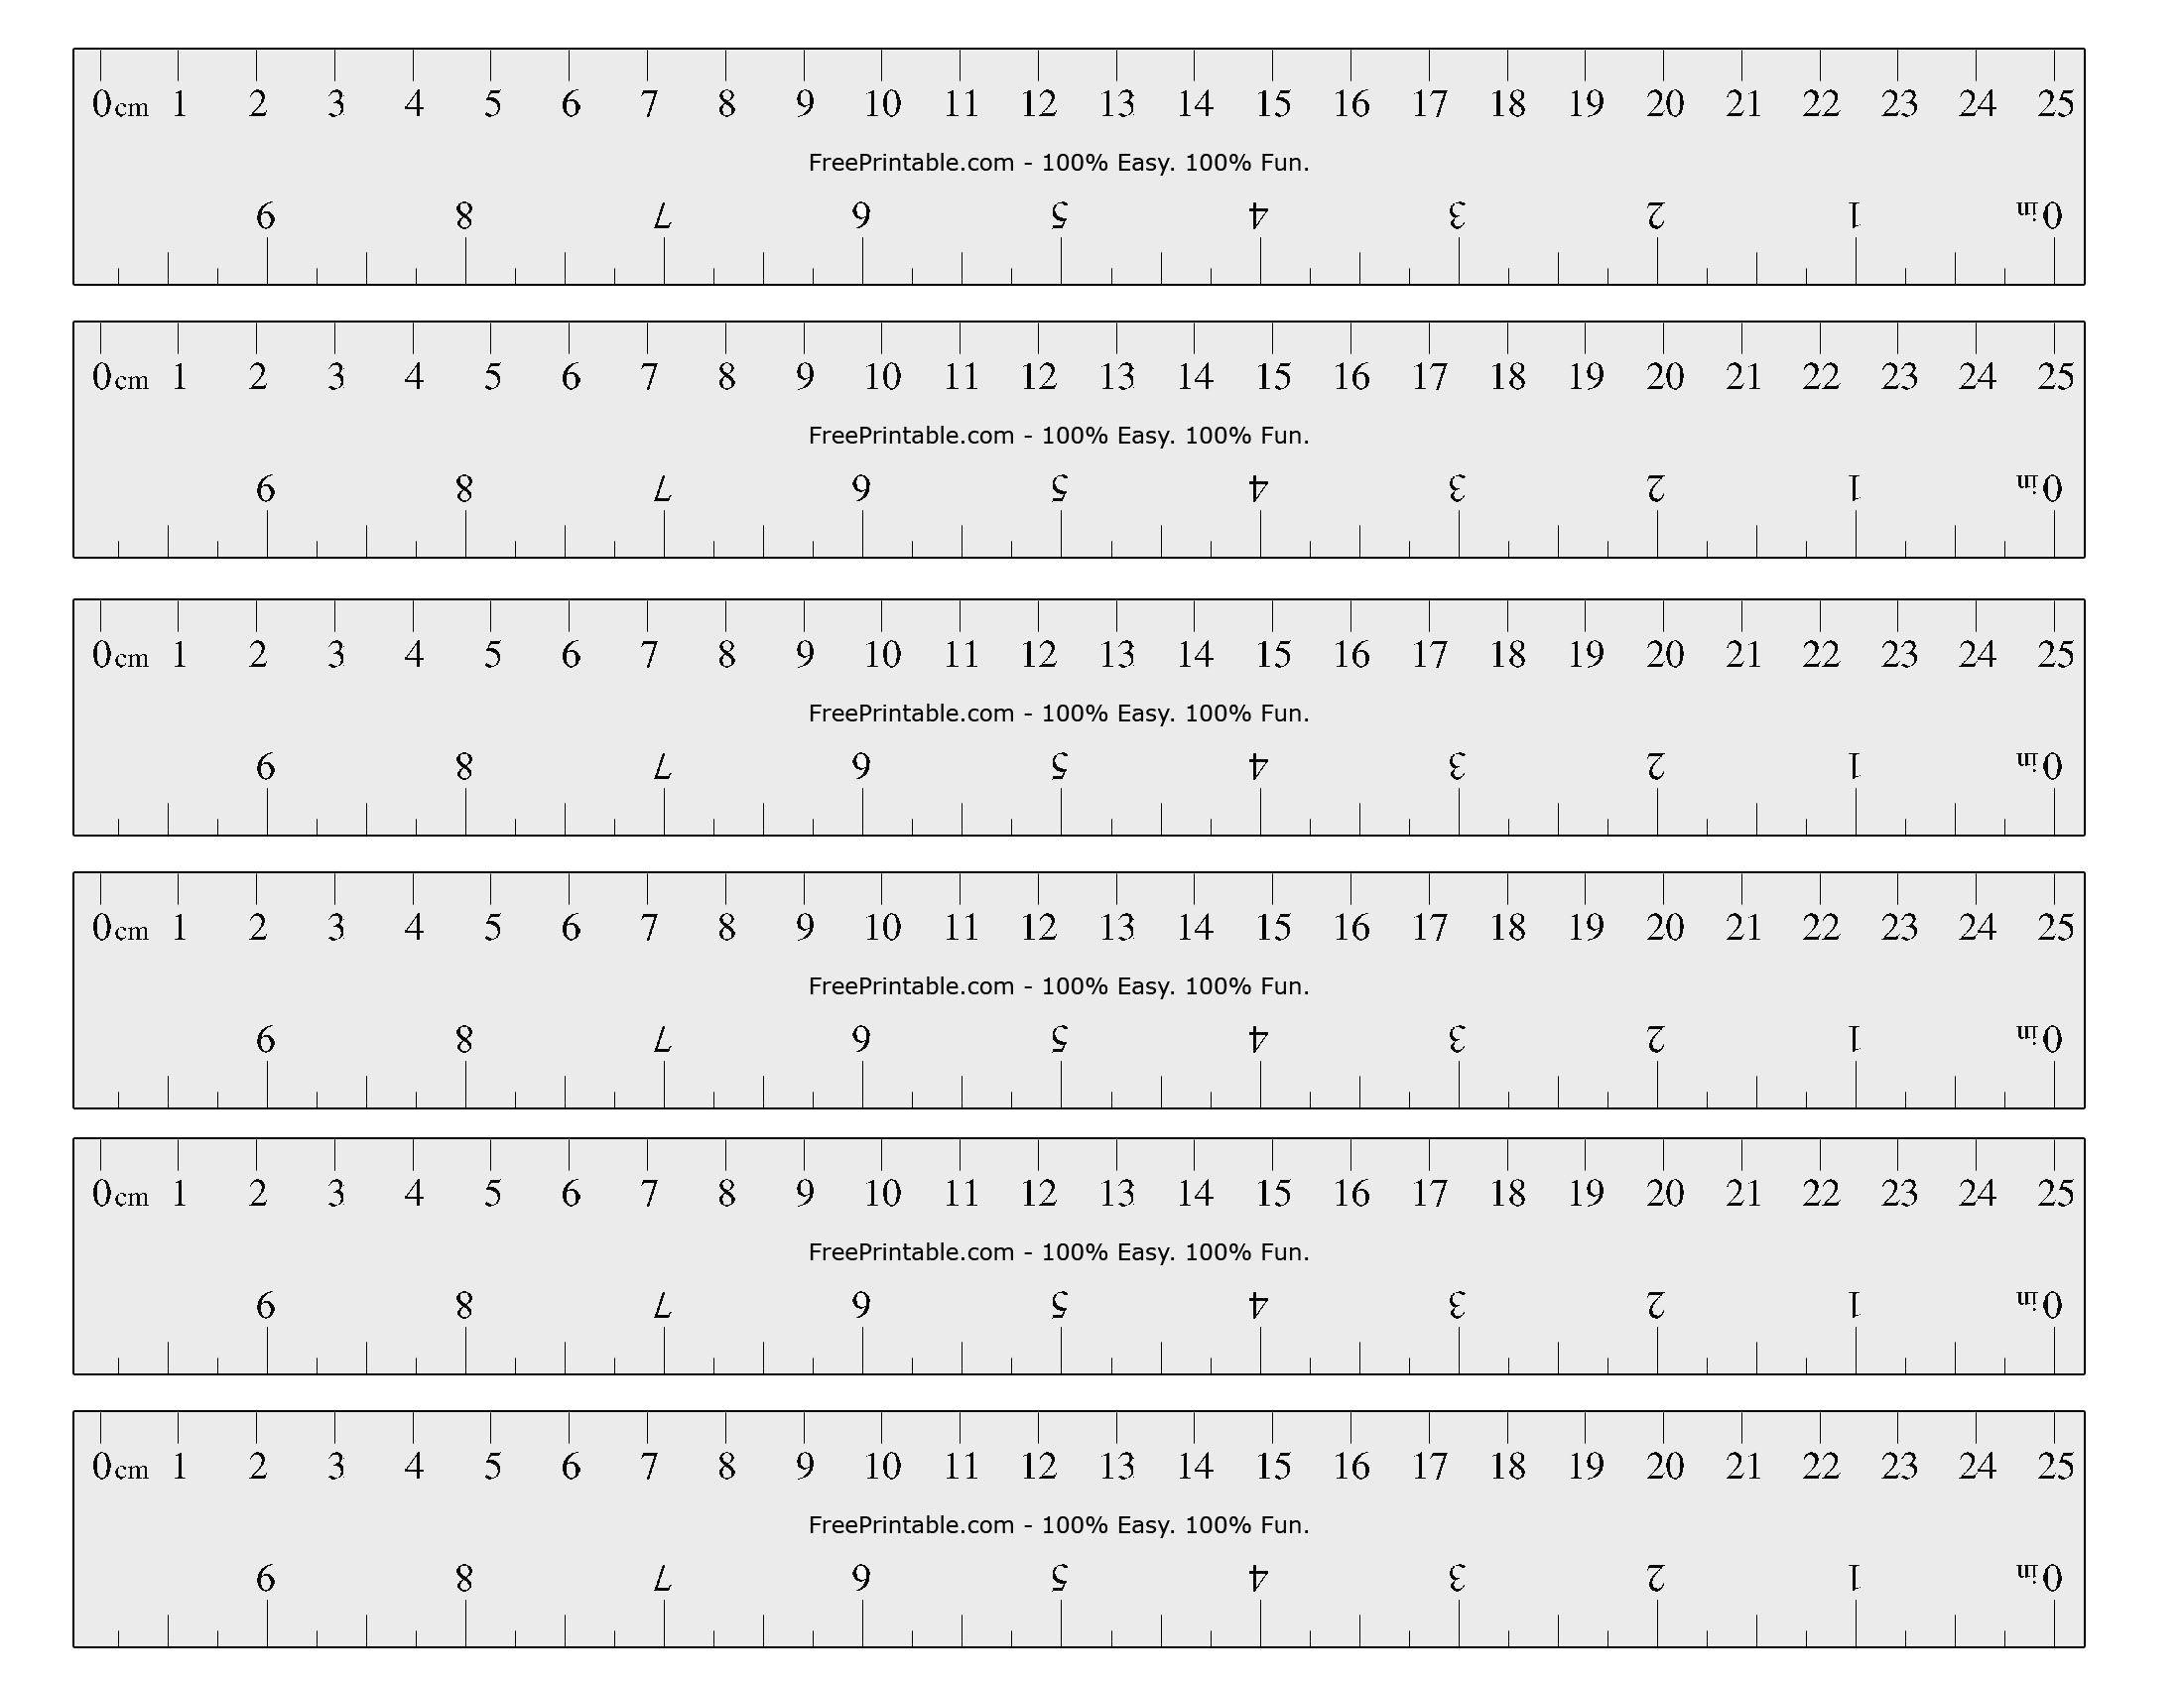 Free Printable Cm/inch Ruler | Math Mania!! | Printable Ruler, Free - Free Printable Cm Ruler